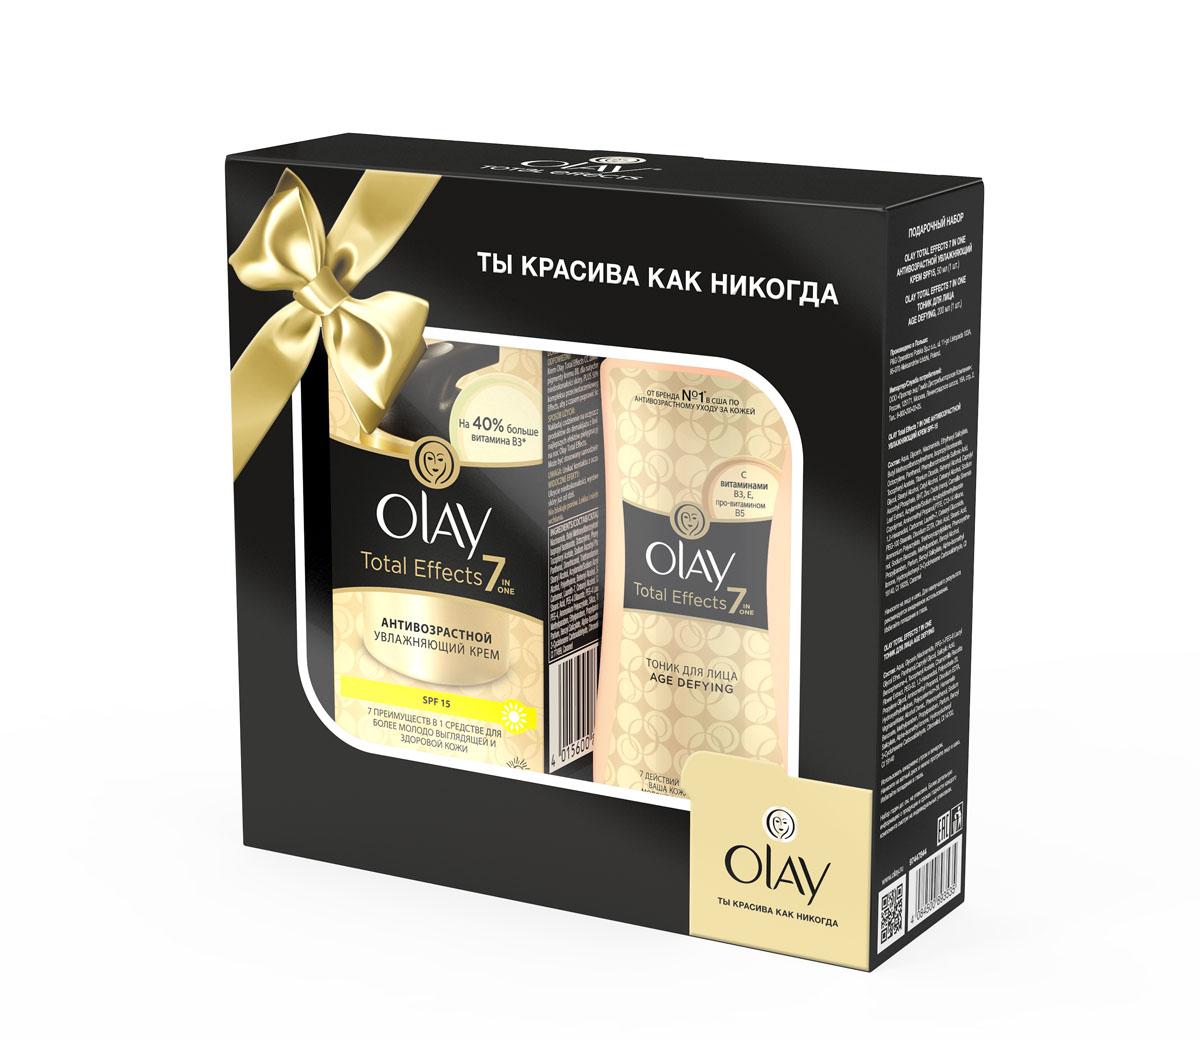 Olay Total Effects Подарочный набор антивозрастной увлажняющий крем SPF 15 (50 мл) + Olay Total Effects тоник для лица Age Defying (200 мл)